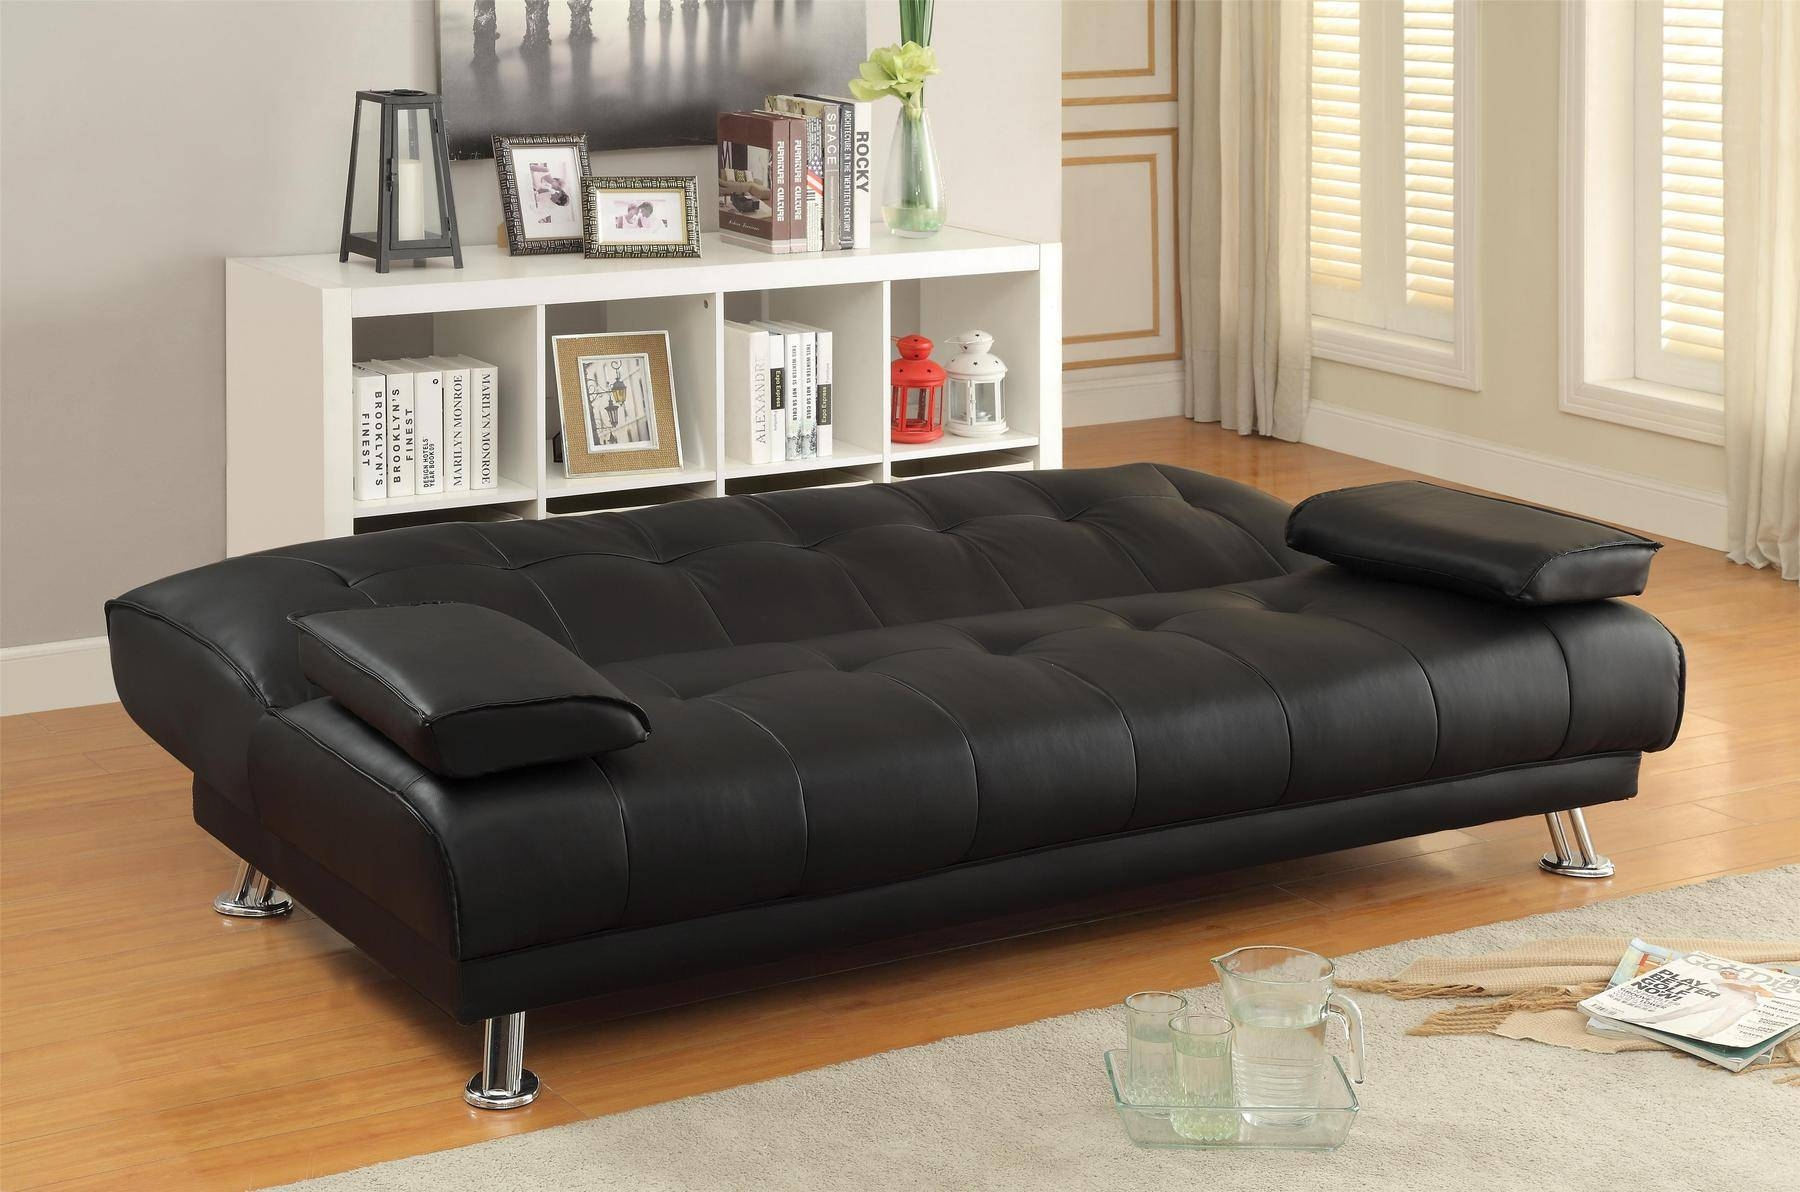 Braxton Sofa | Sofa Gallery | Kengire throughout Braxton Sofa (Image 27 of 30)